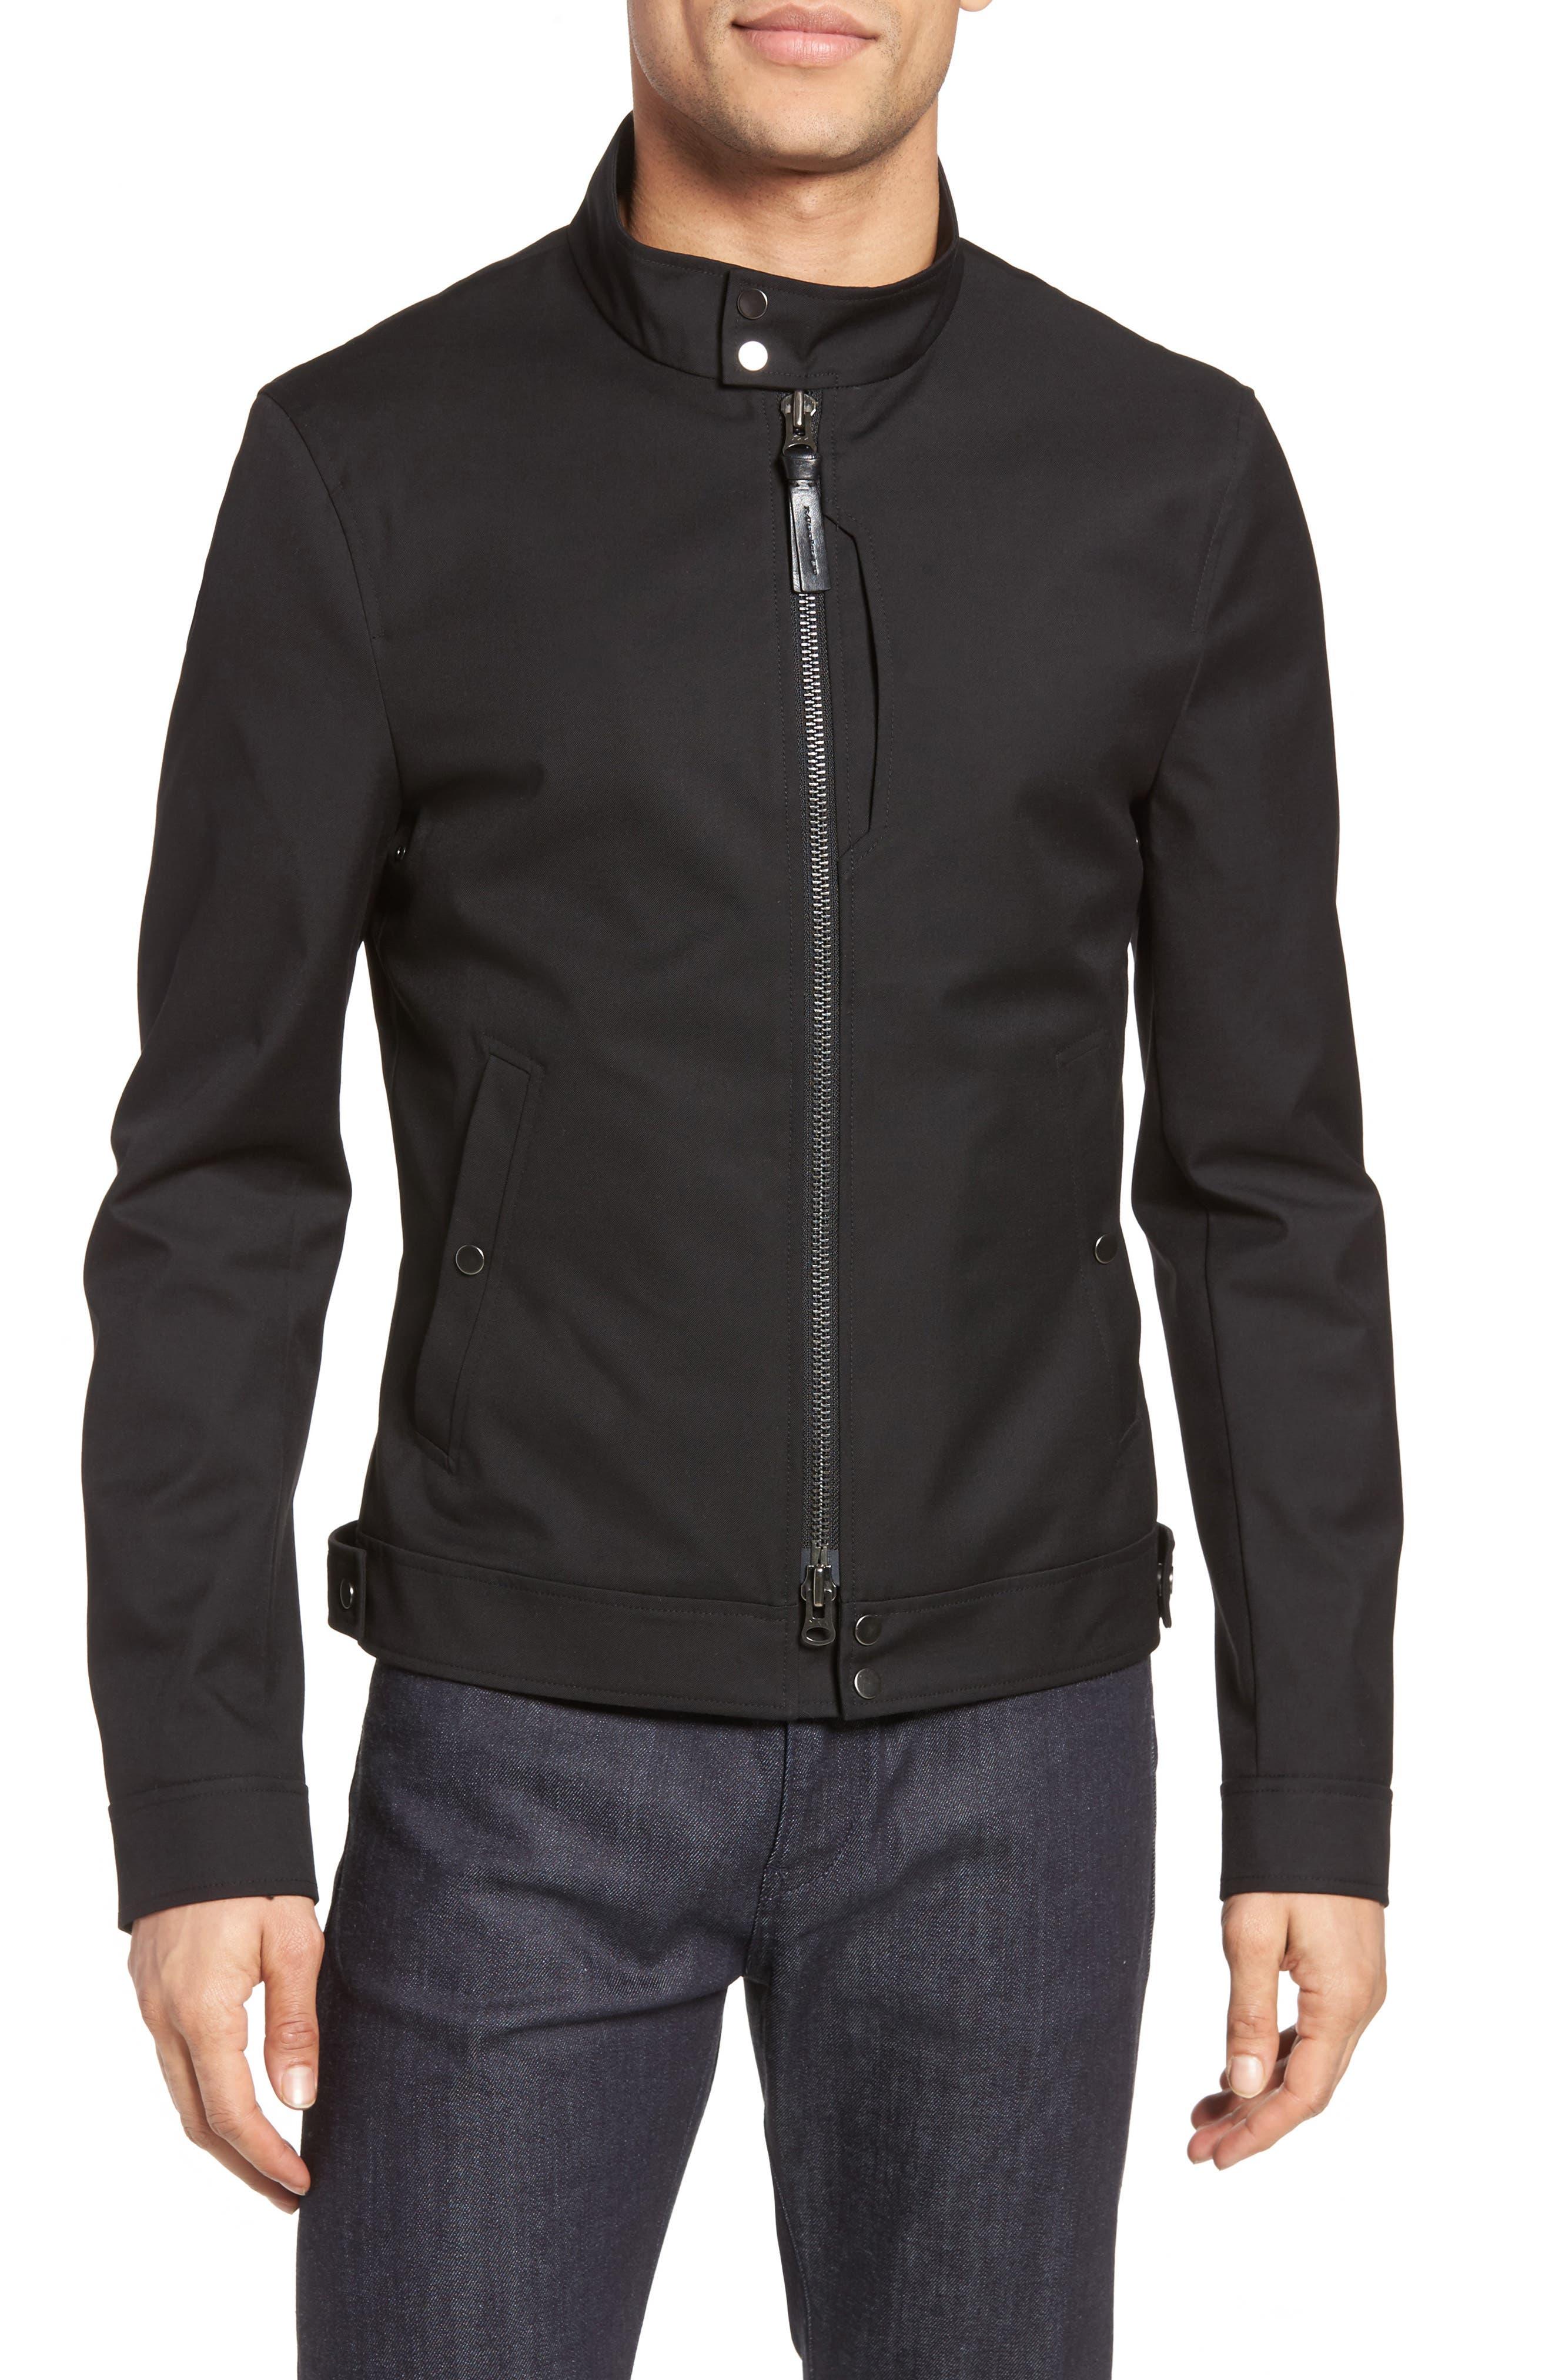 MACKAGE Twill Moto Jacket